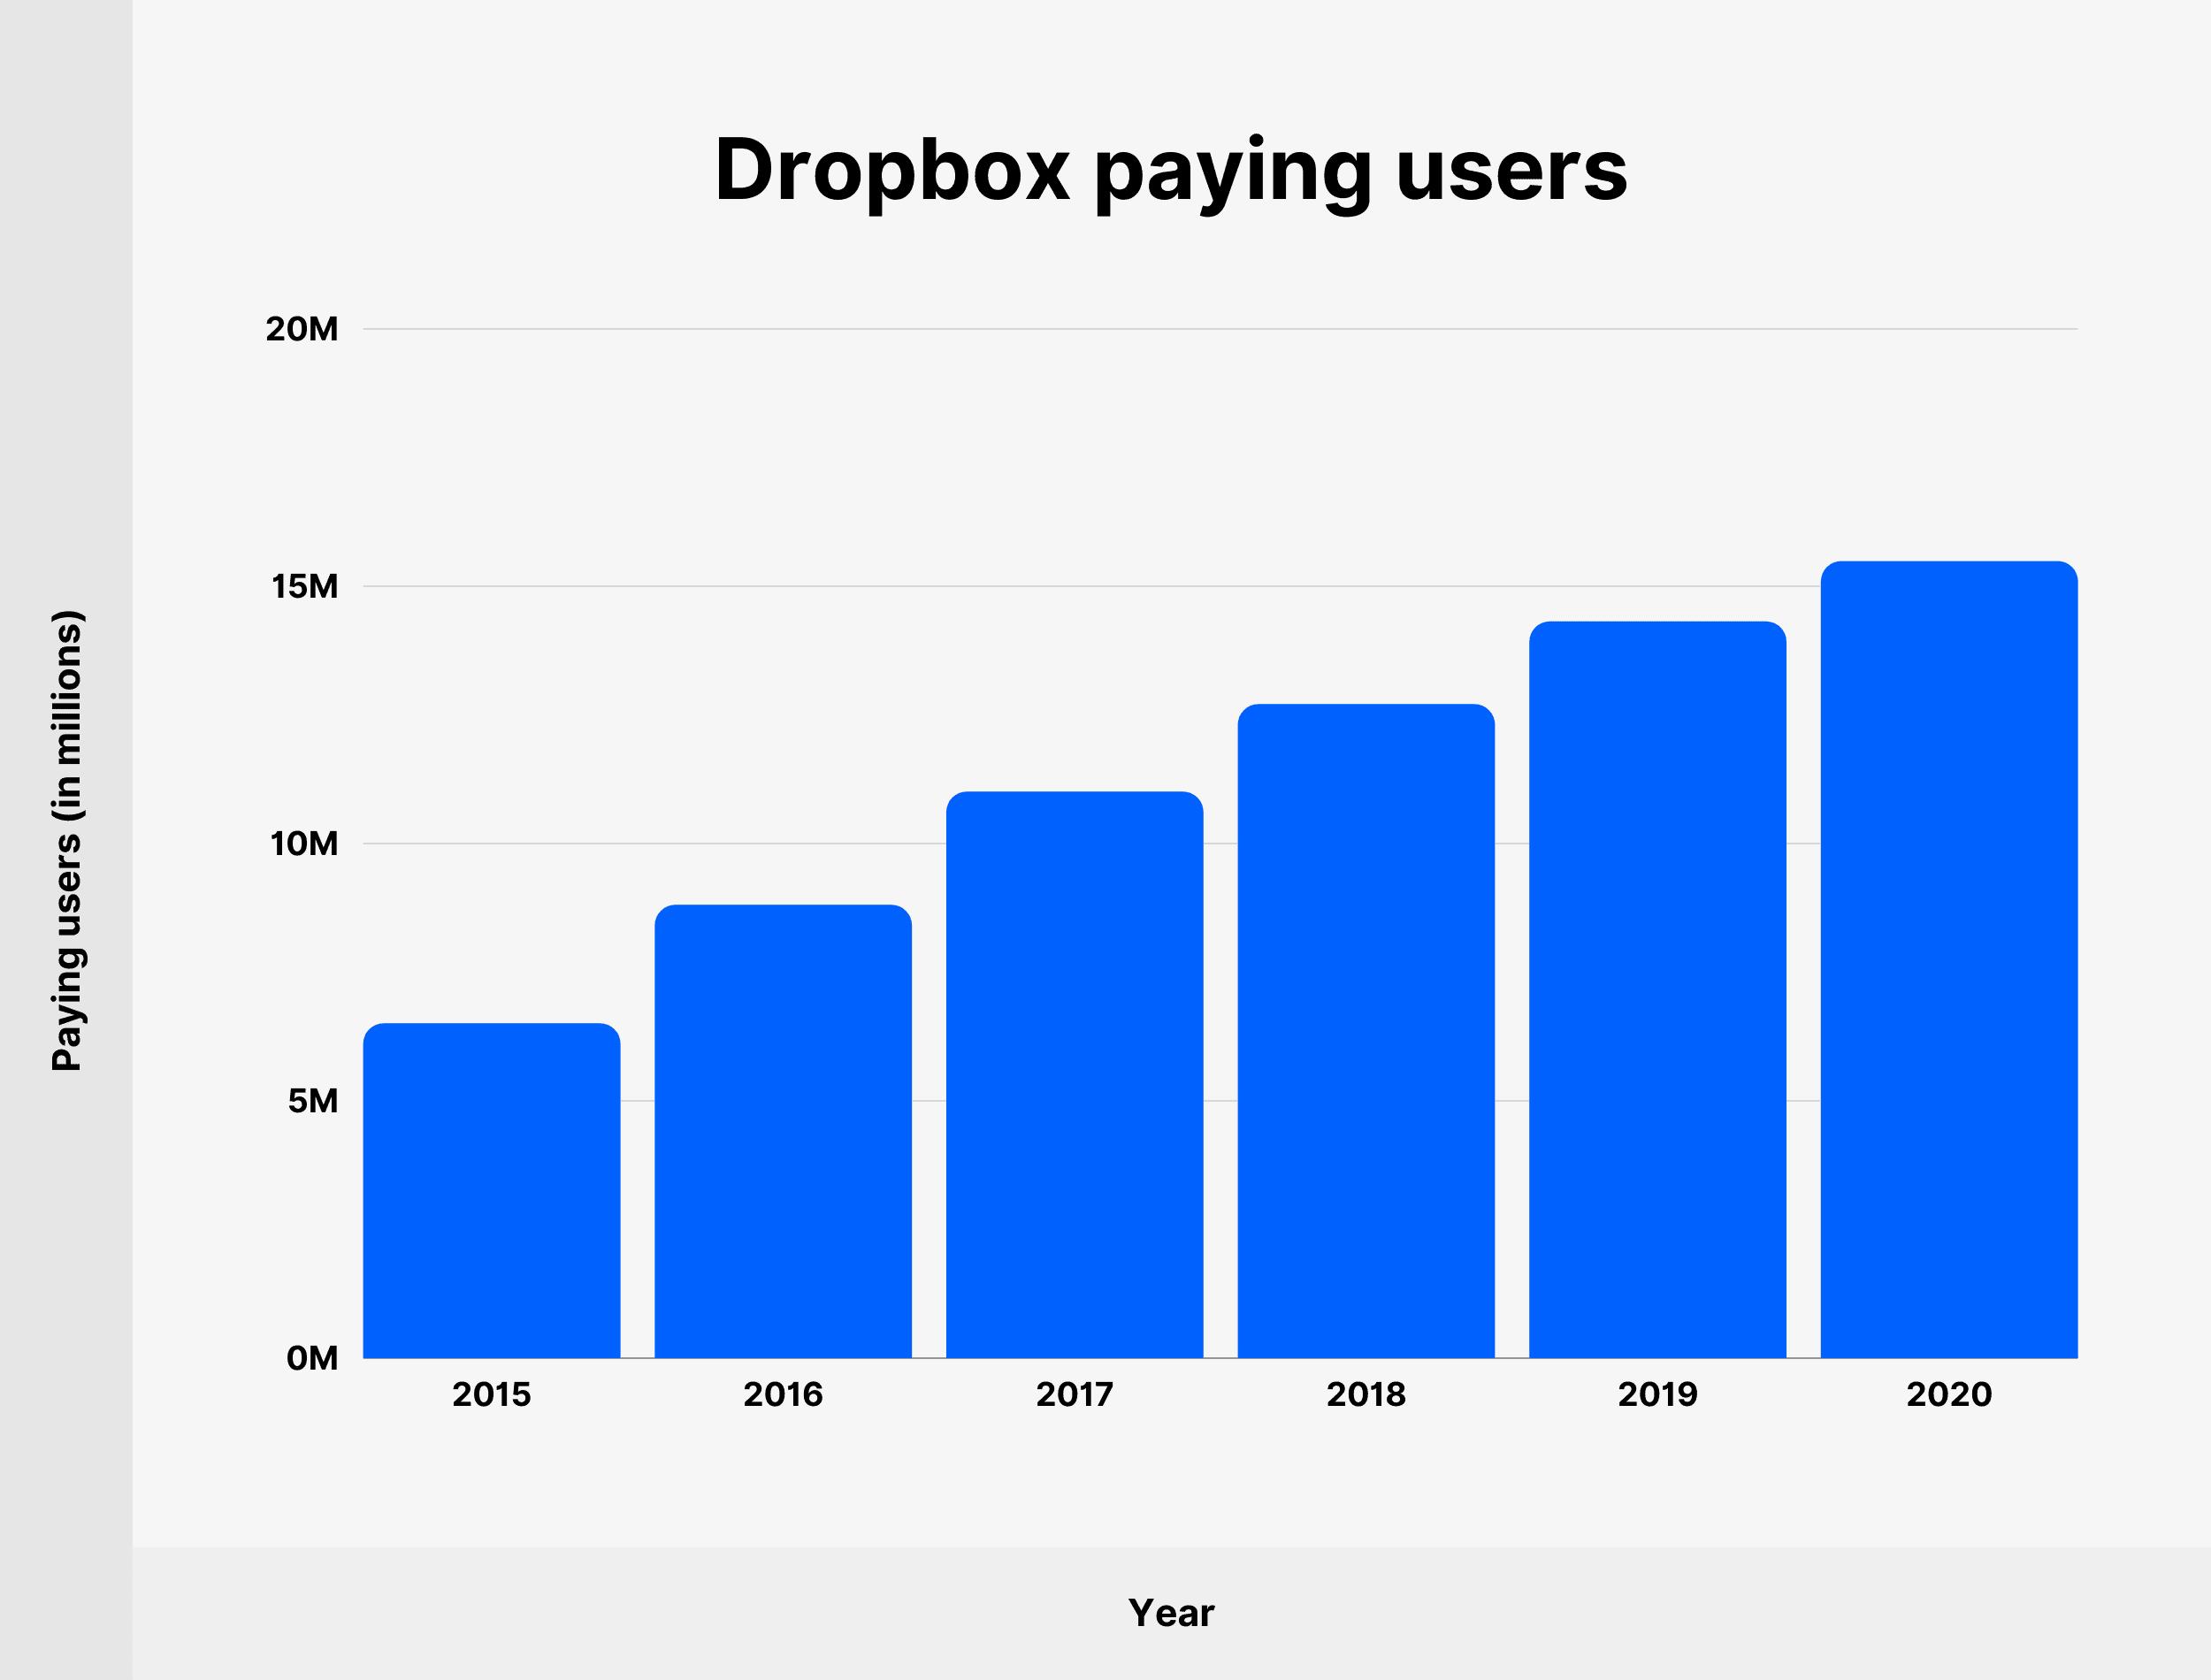 Dropbox paying users